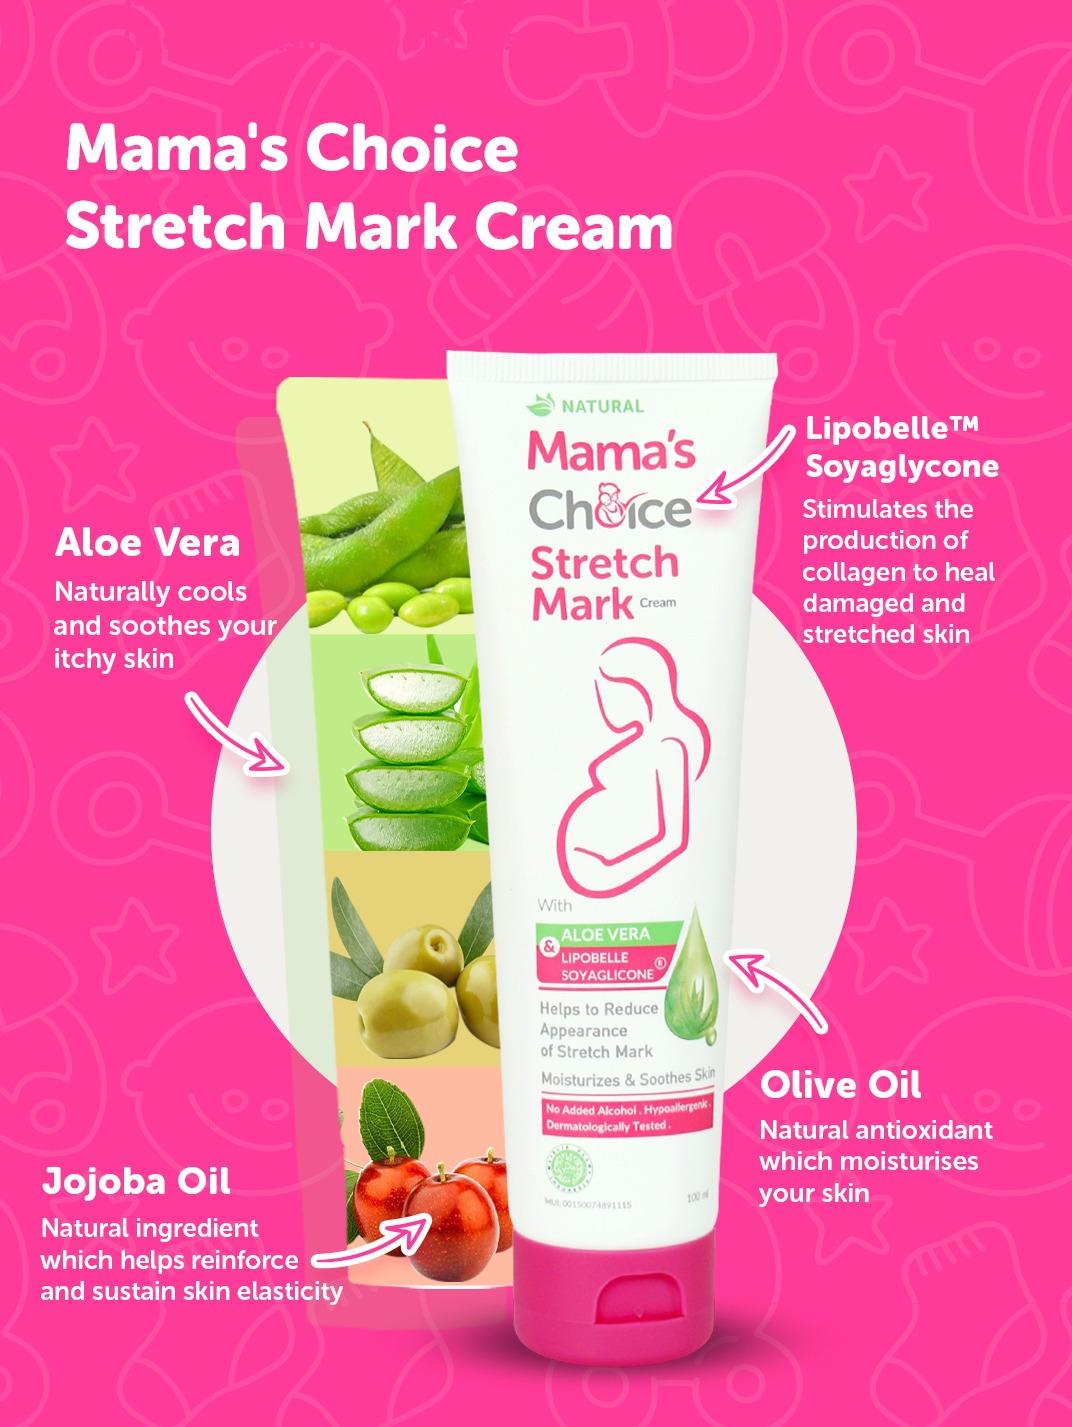 Mama's Choice paraben-free Stretch Mark Cream ingredients